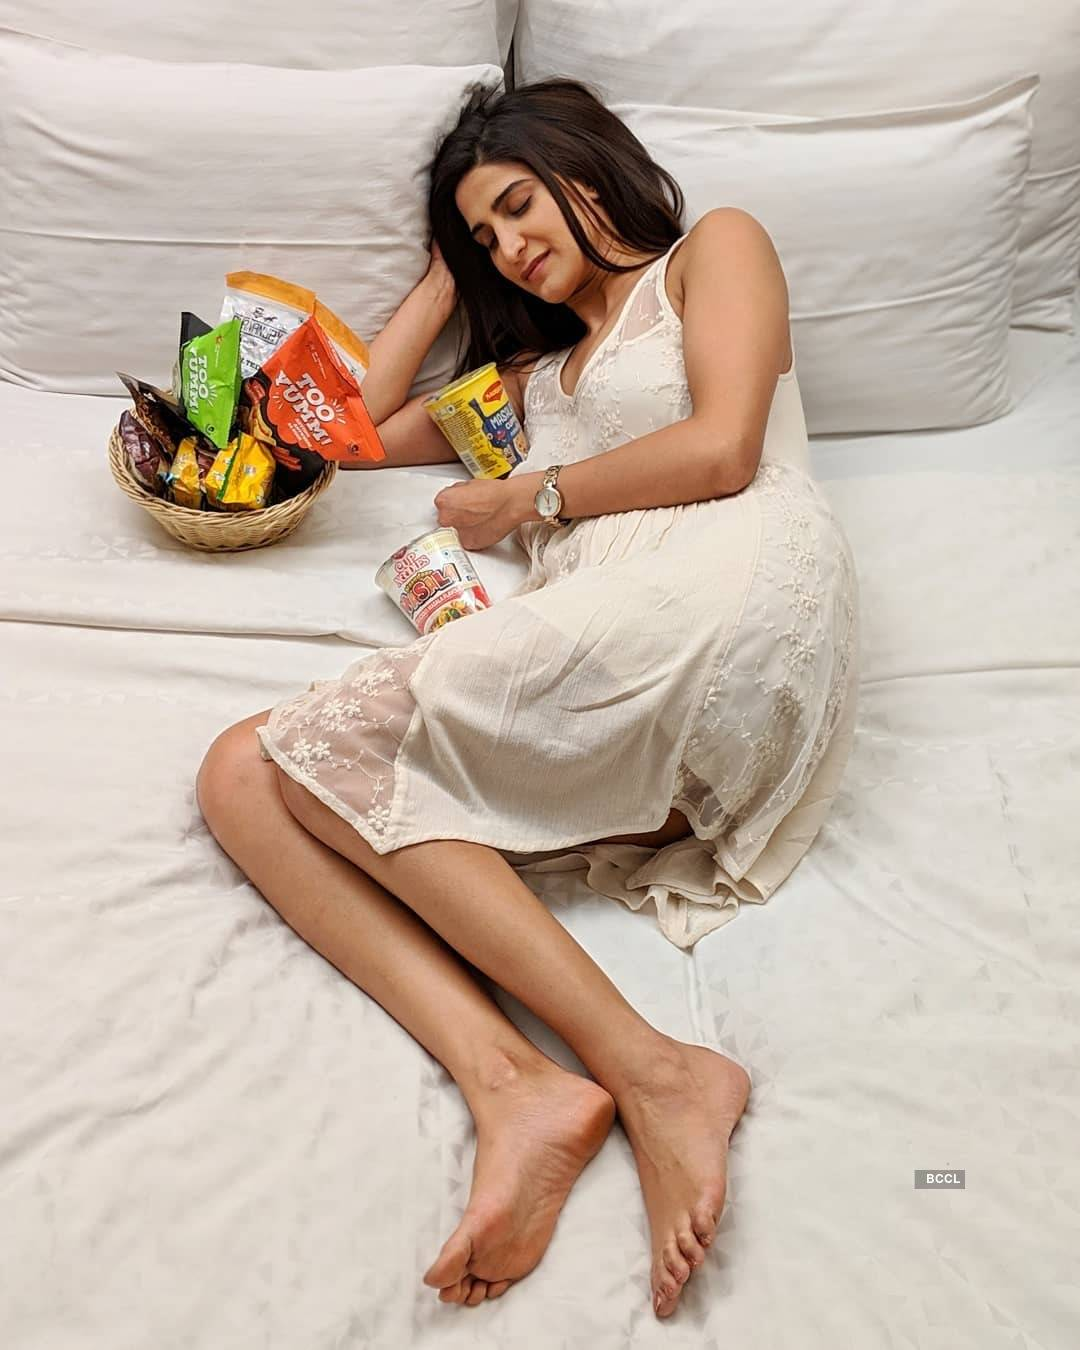 Beautiful pictures of Aahana Kumra, who was trolled for wearing a bikini